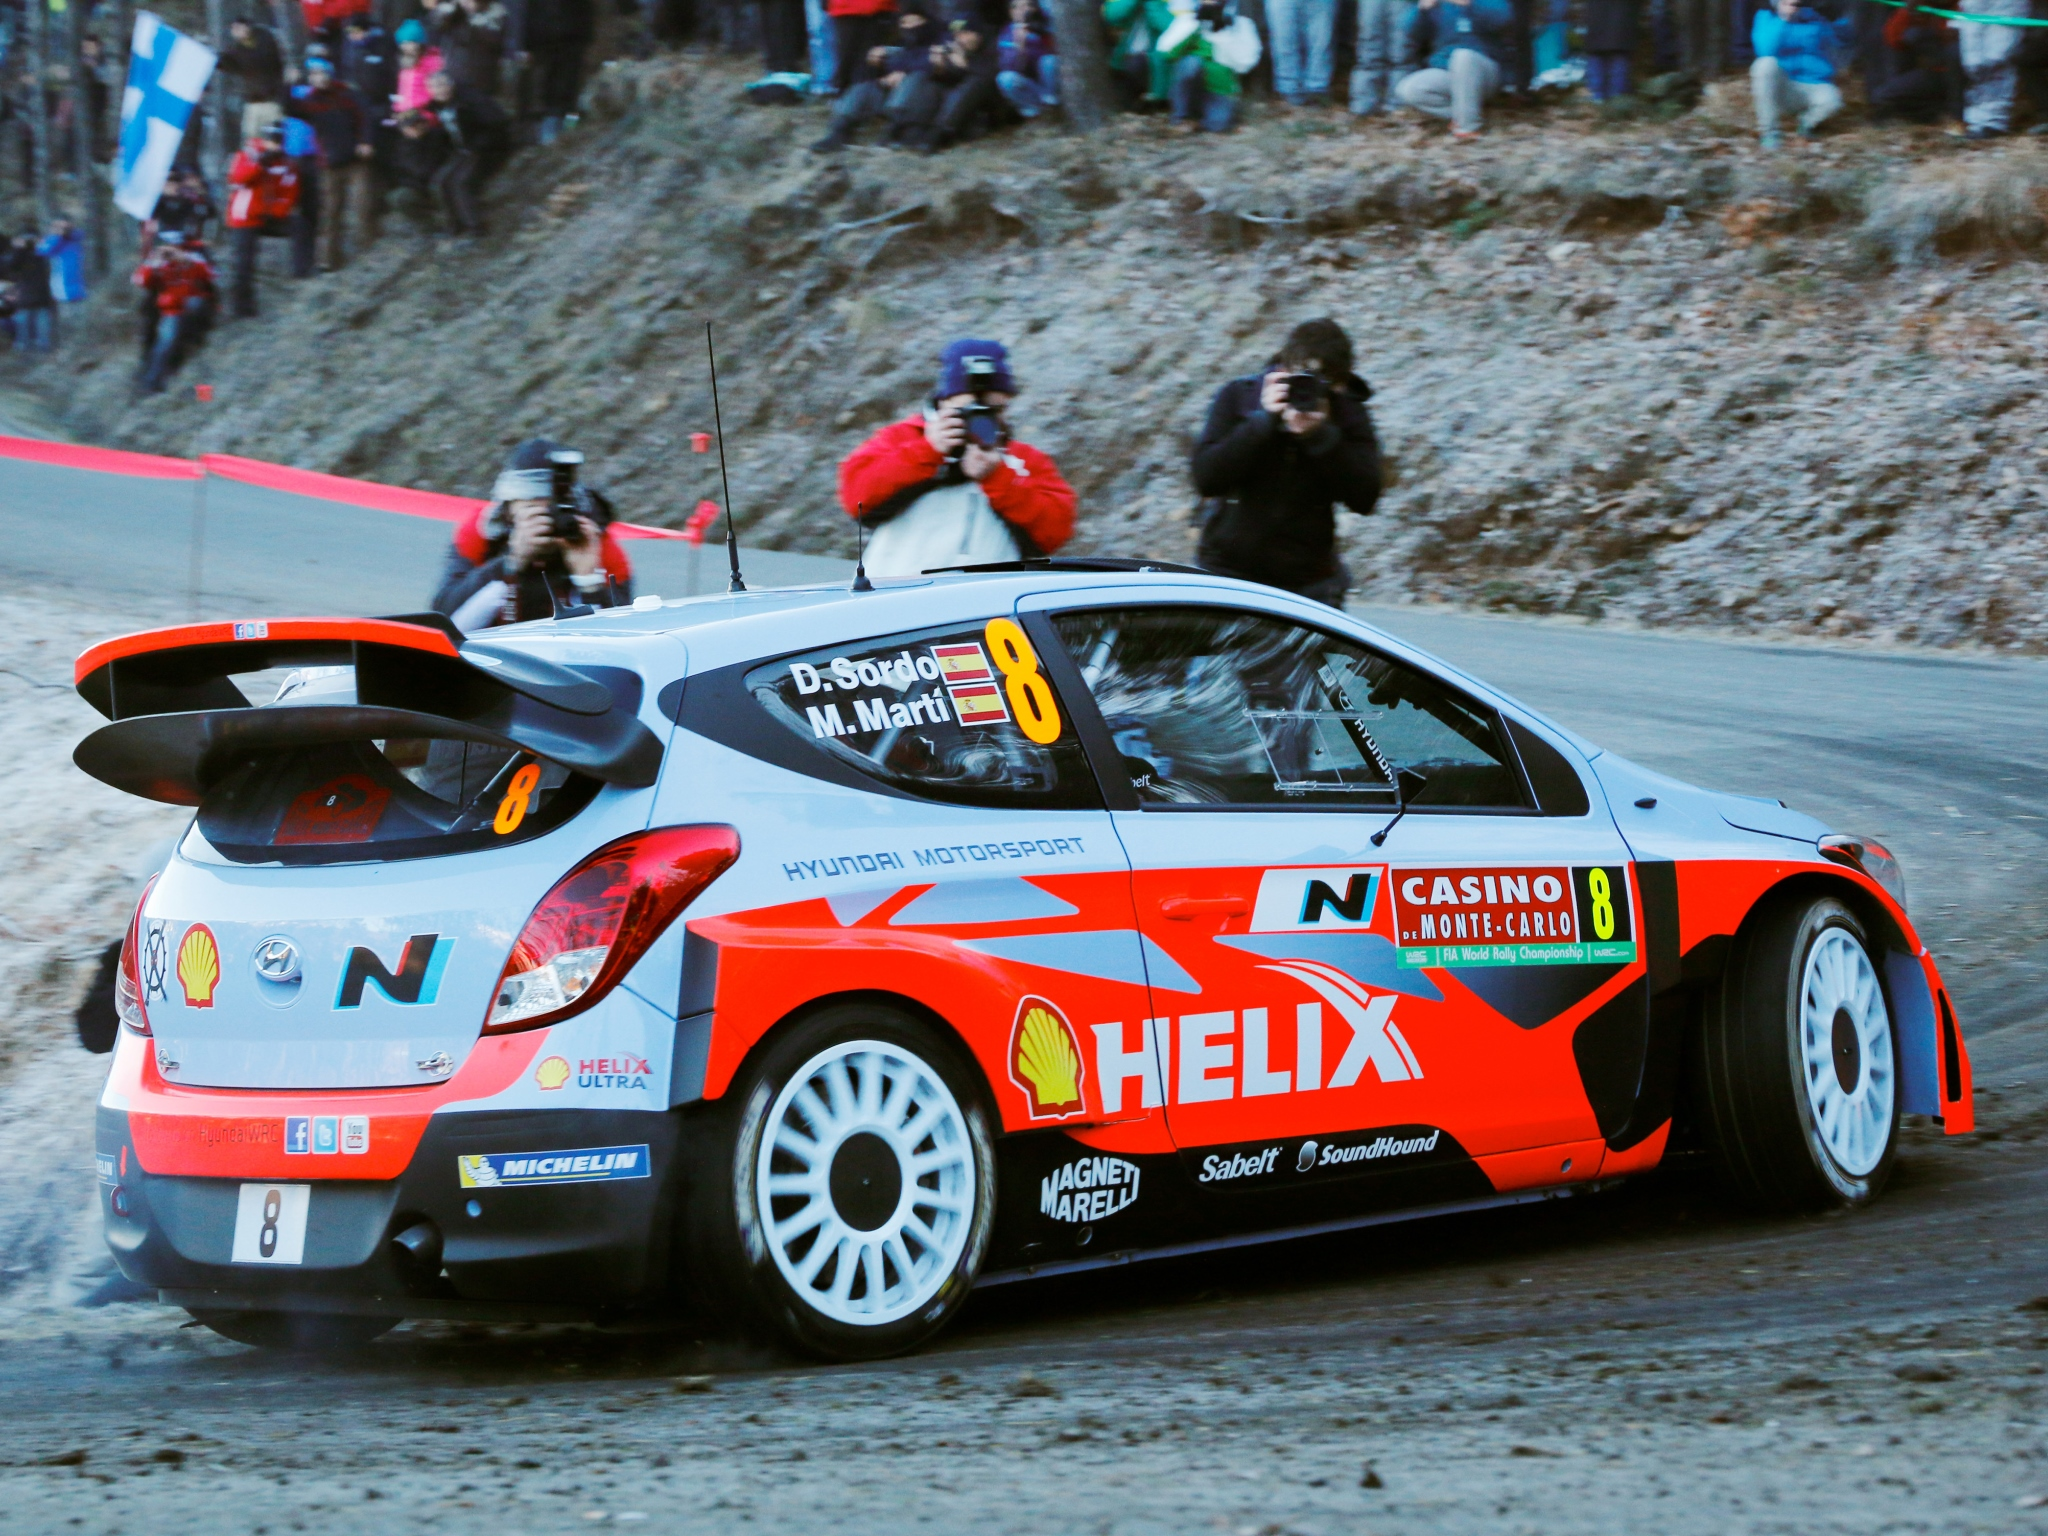 Hyundai Cars 2014 >> 2014 Hyundai i20 WRC race racing h wallpaper | 2048x1536 | 230756 | WallpaperUP